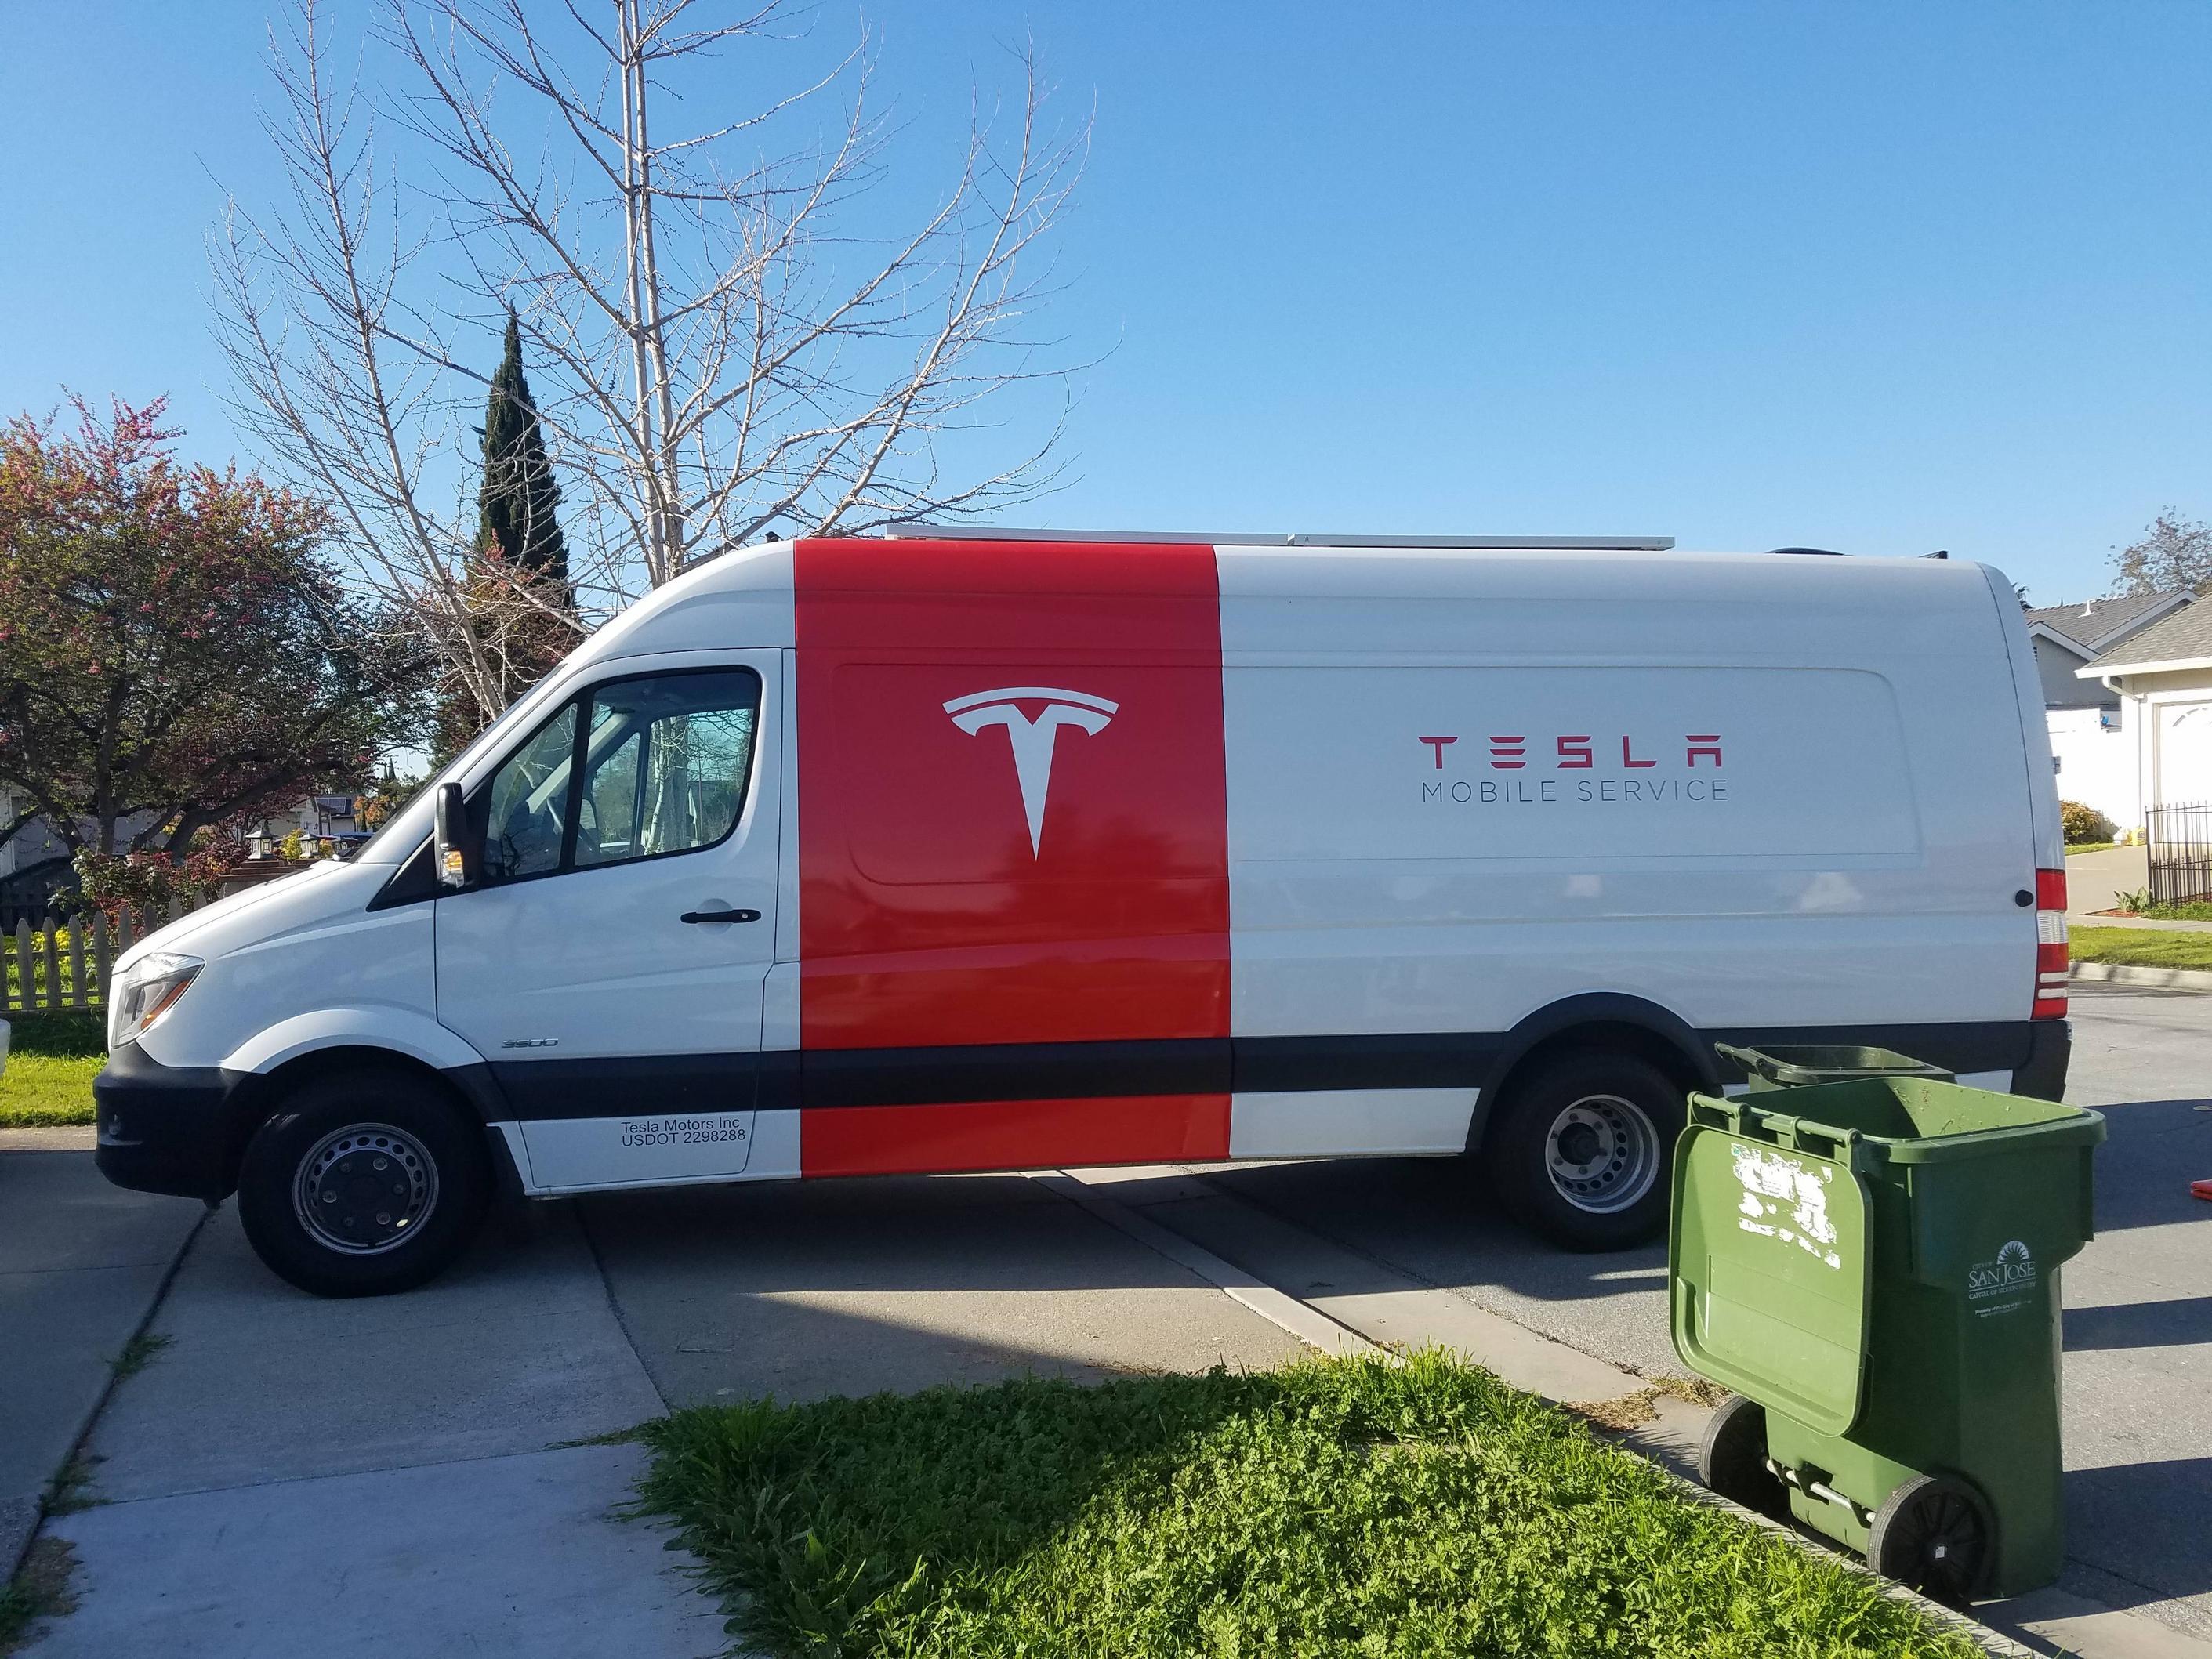 Tesla Mobile